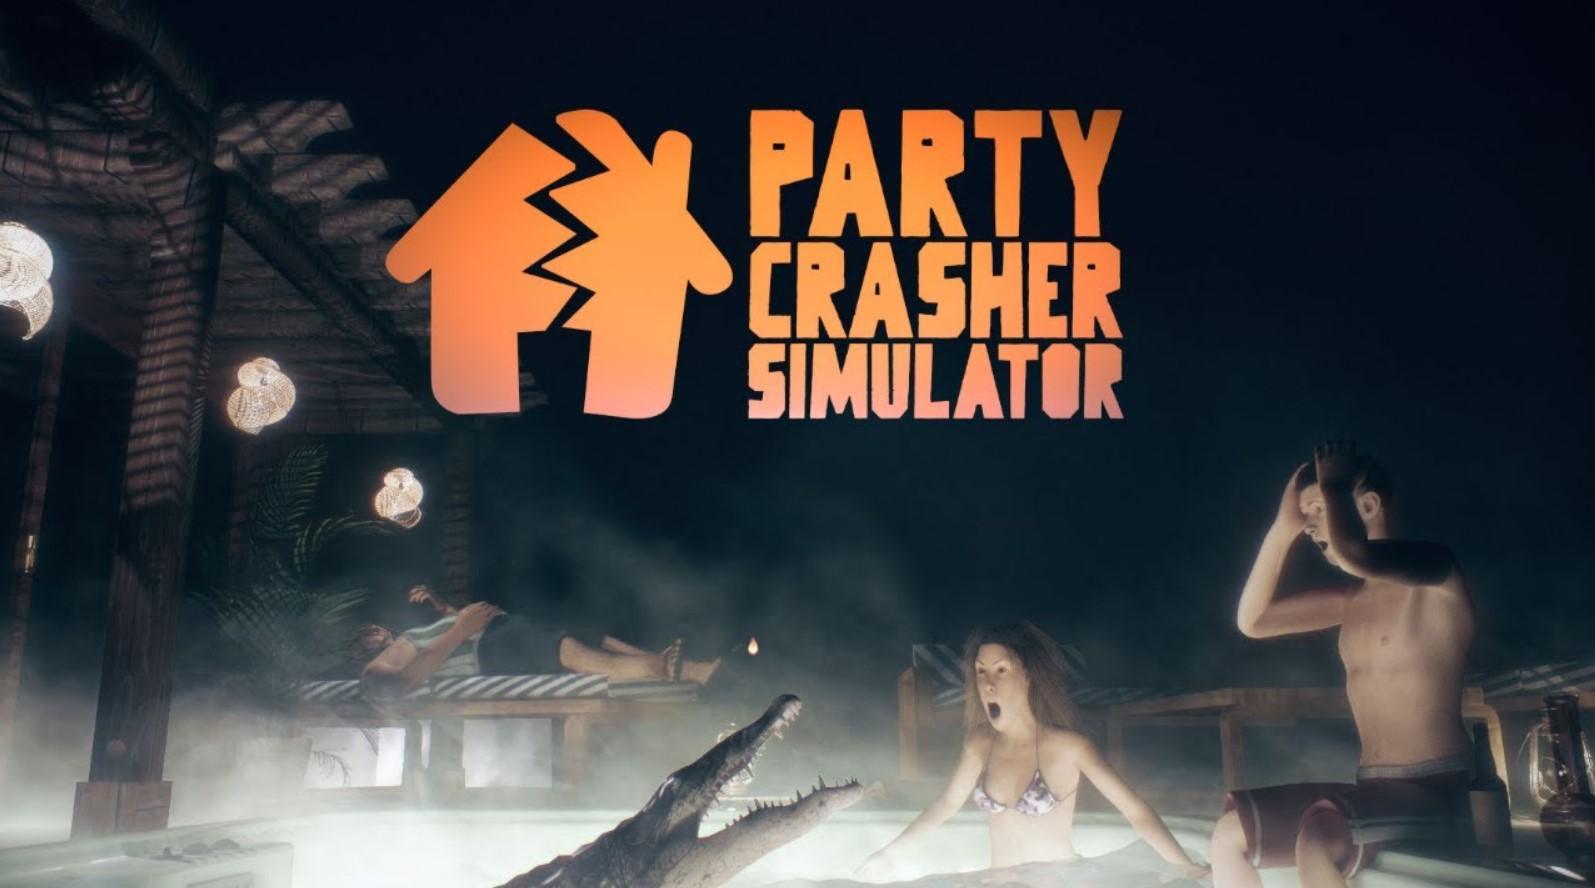 Party Crasher Simulator Nintendo Switch Version Full Game Free Download